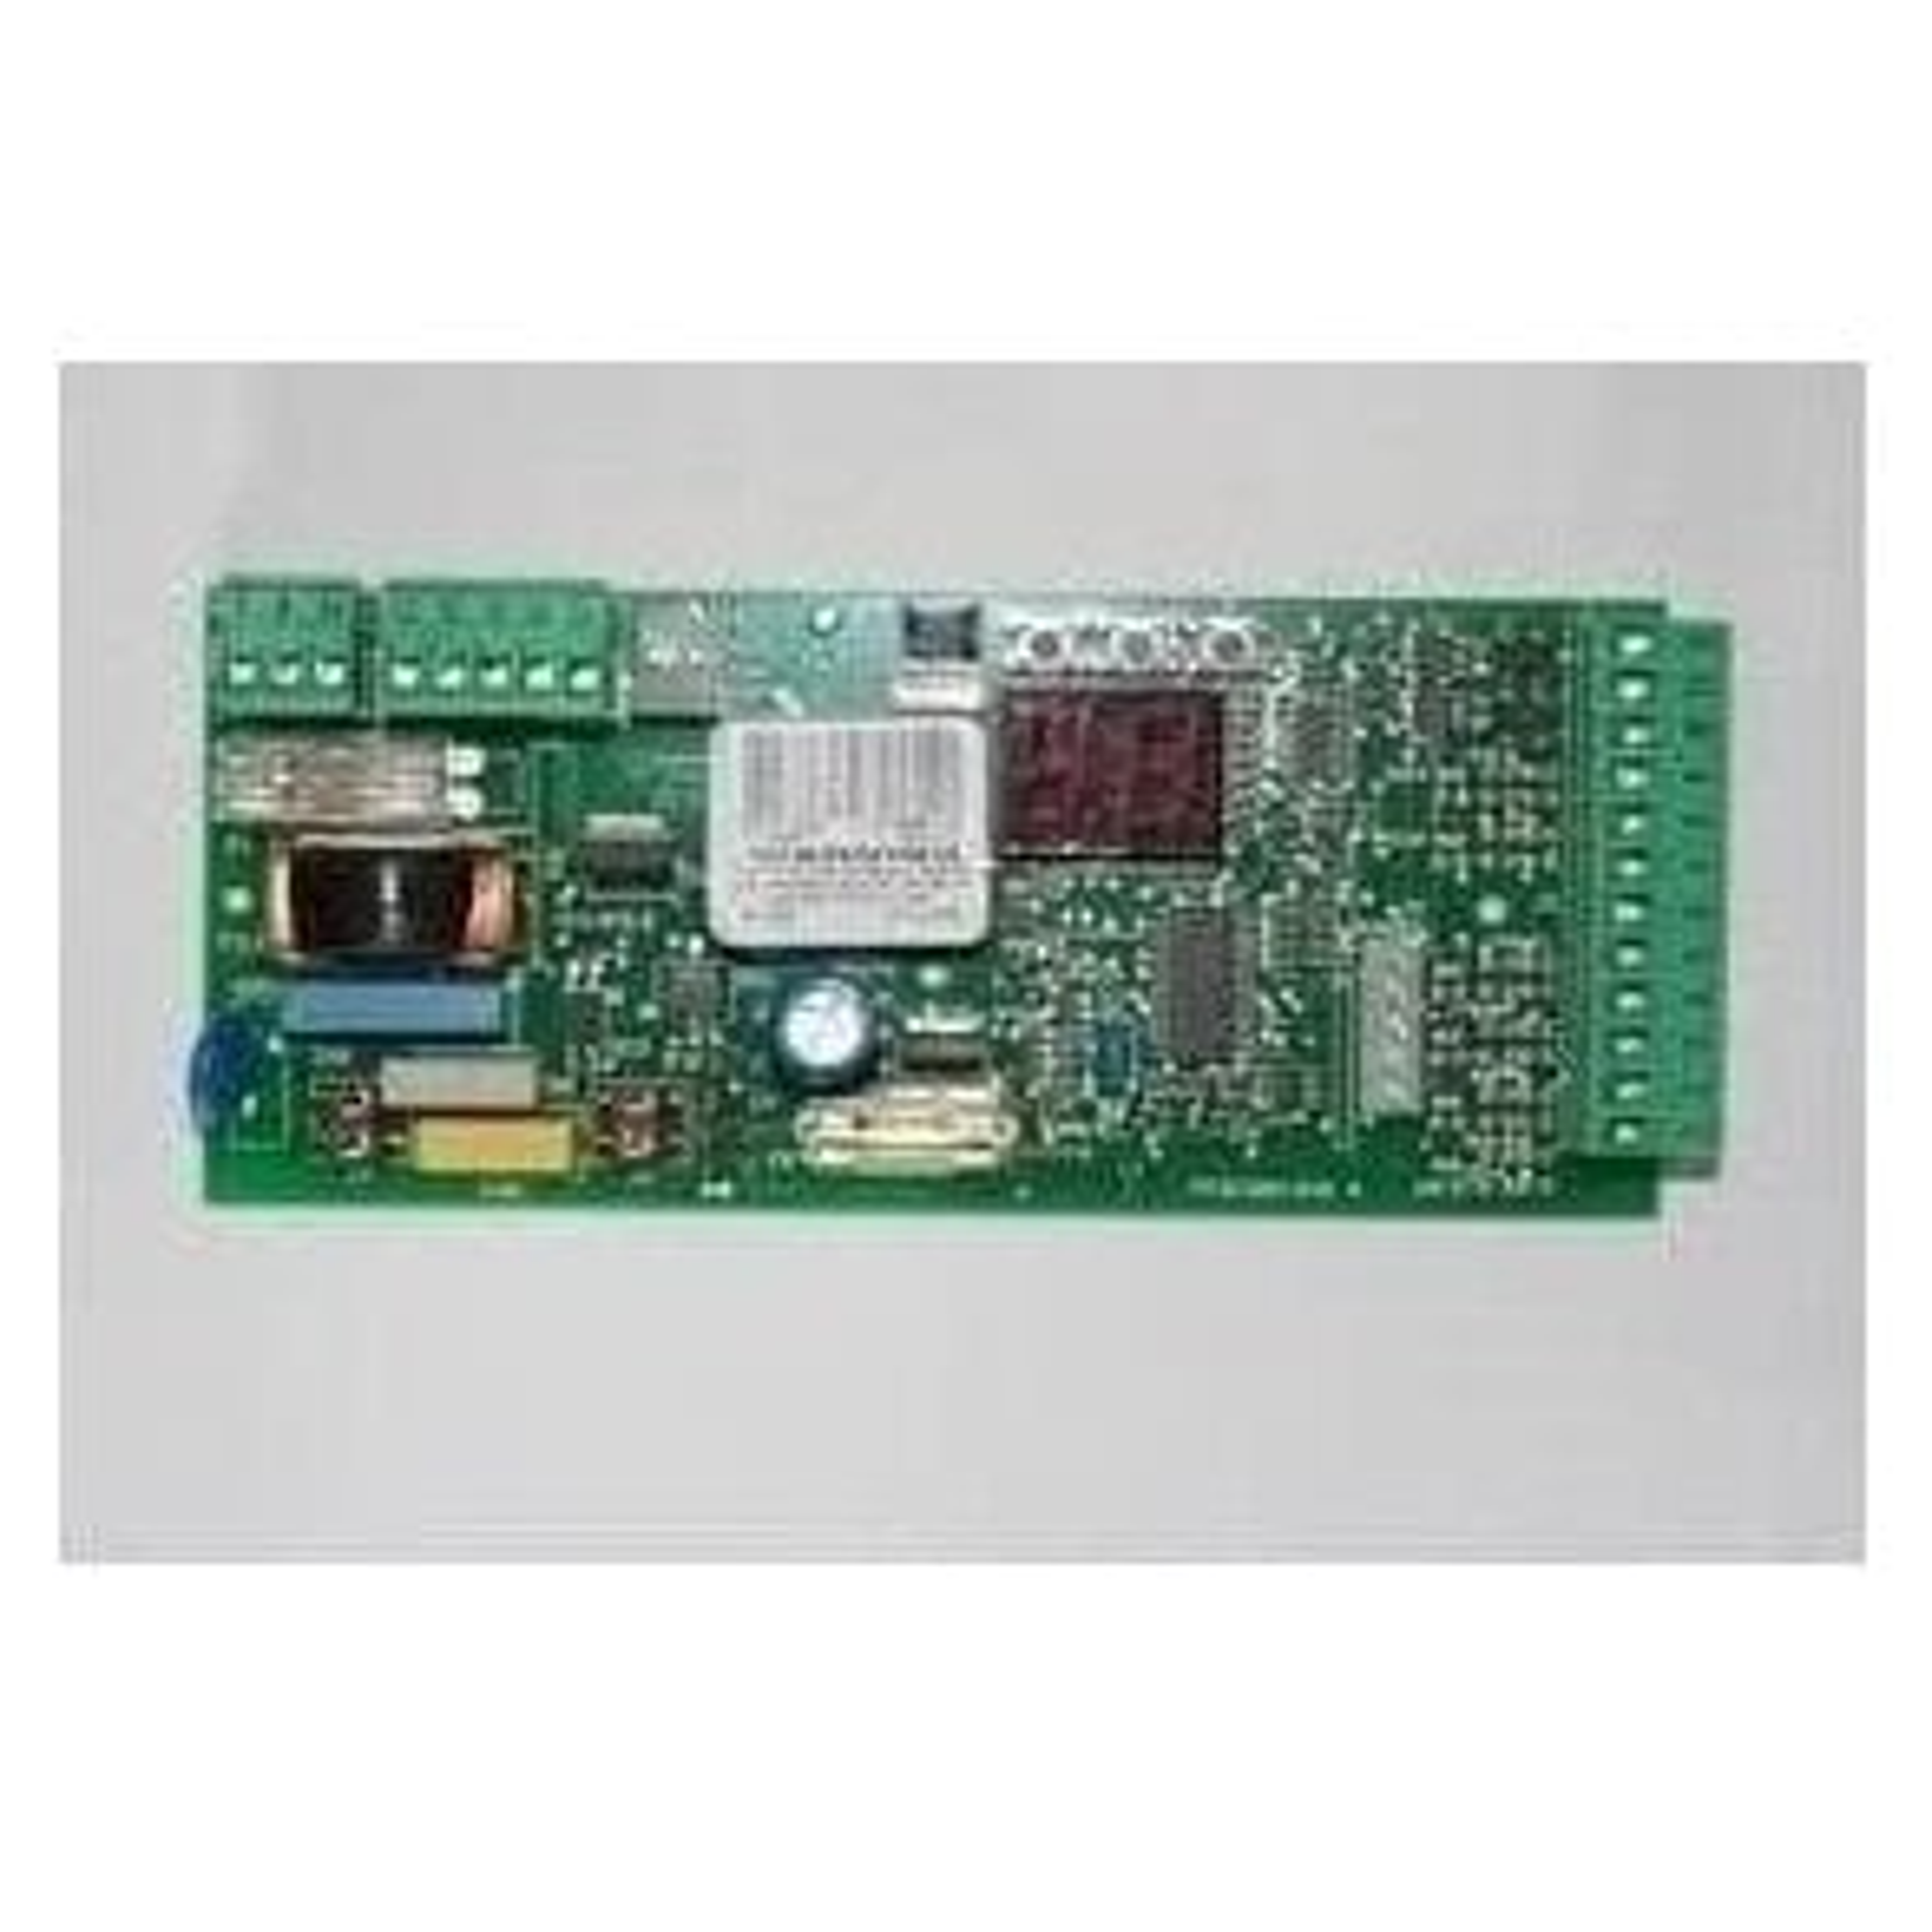 780 D control board